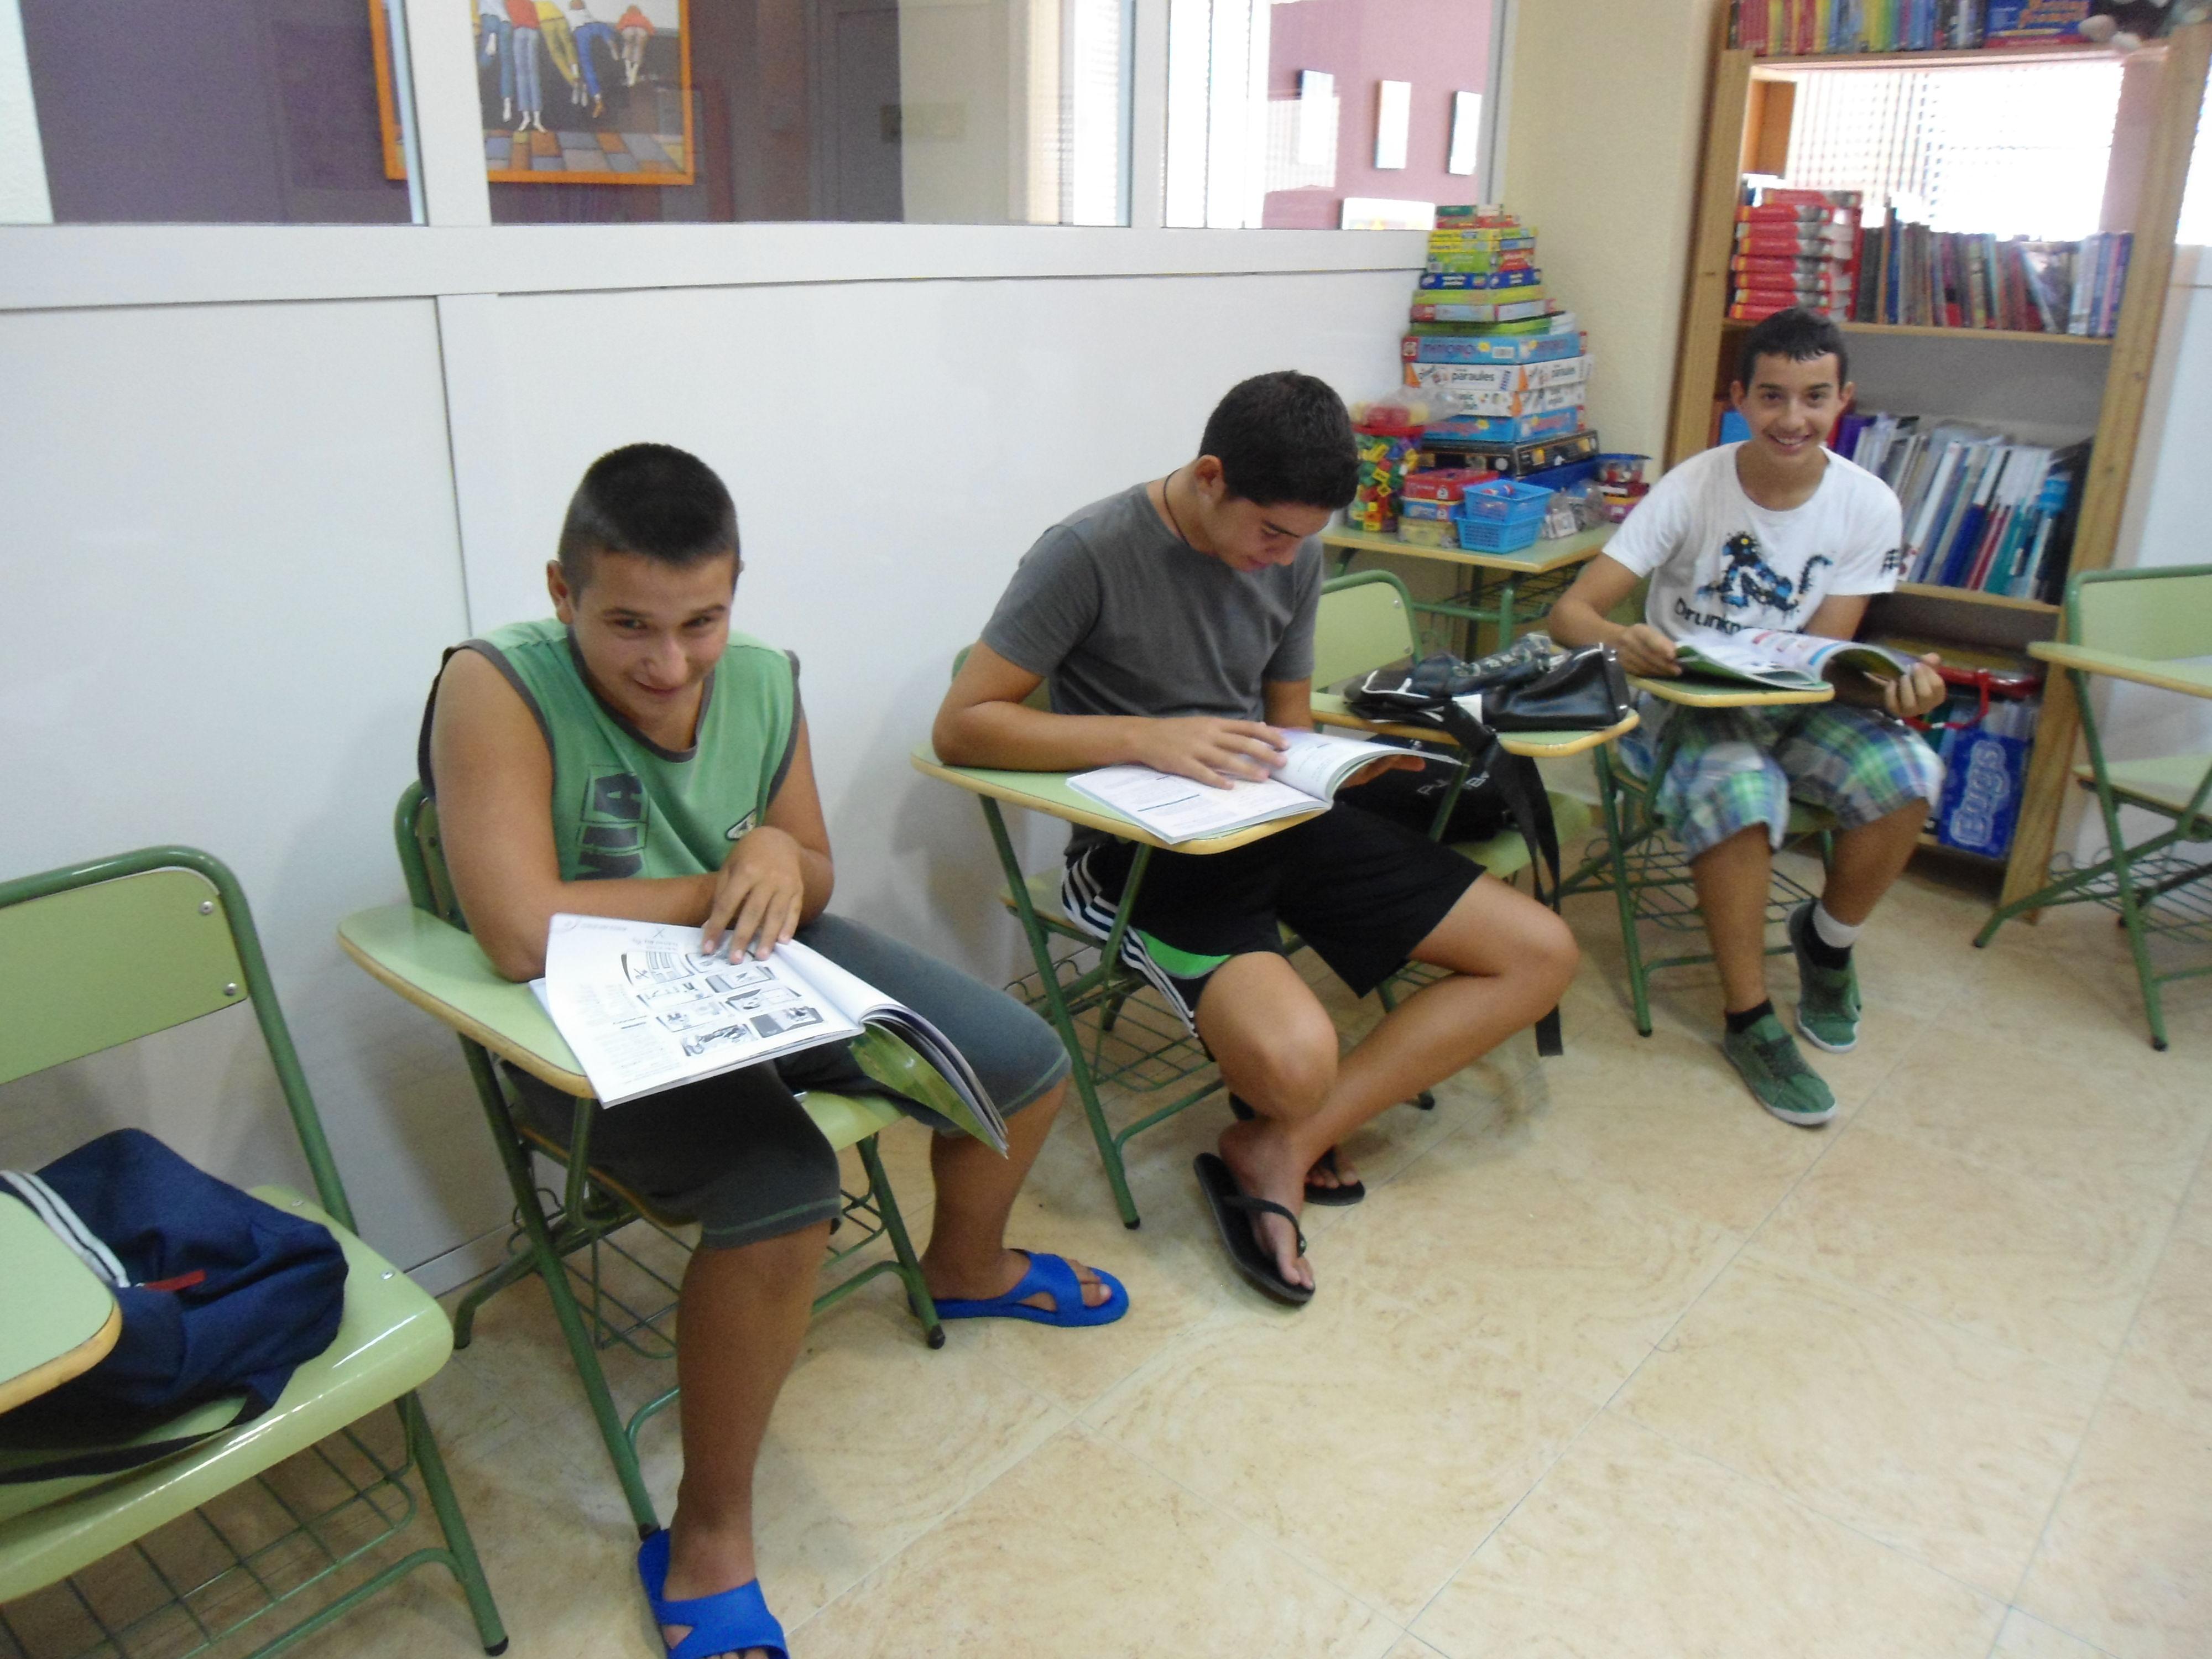 Foto 29 de Academias de idiomas en Moncada | Centre d'Estudis Etnies